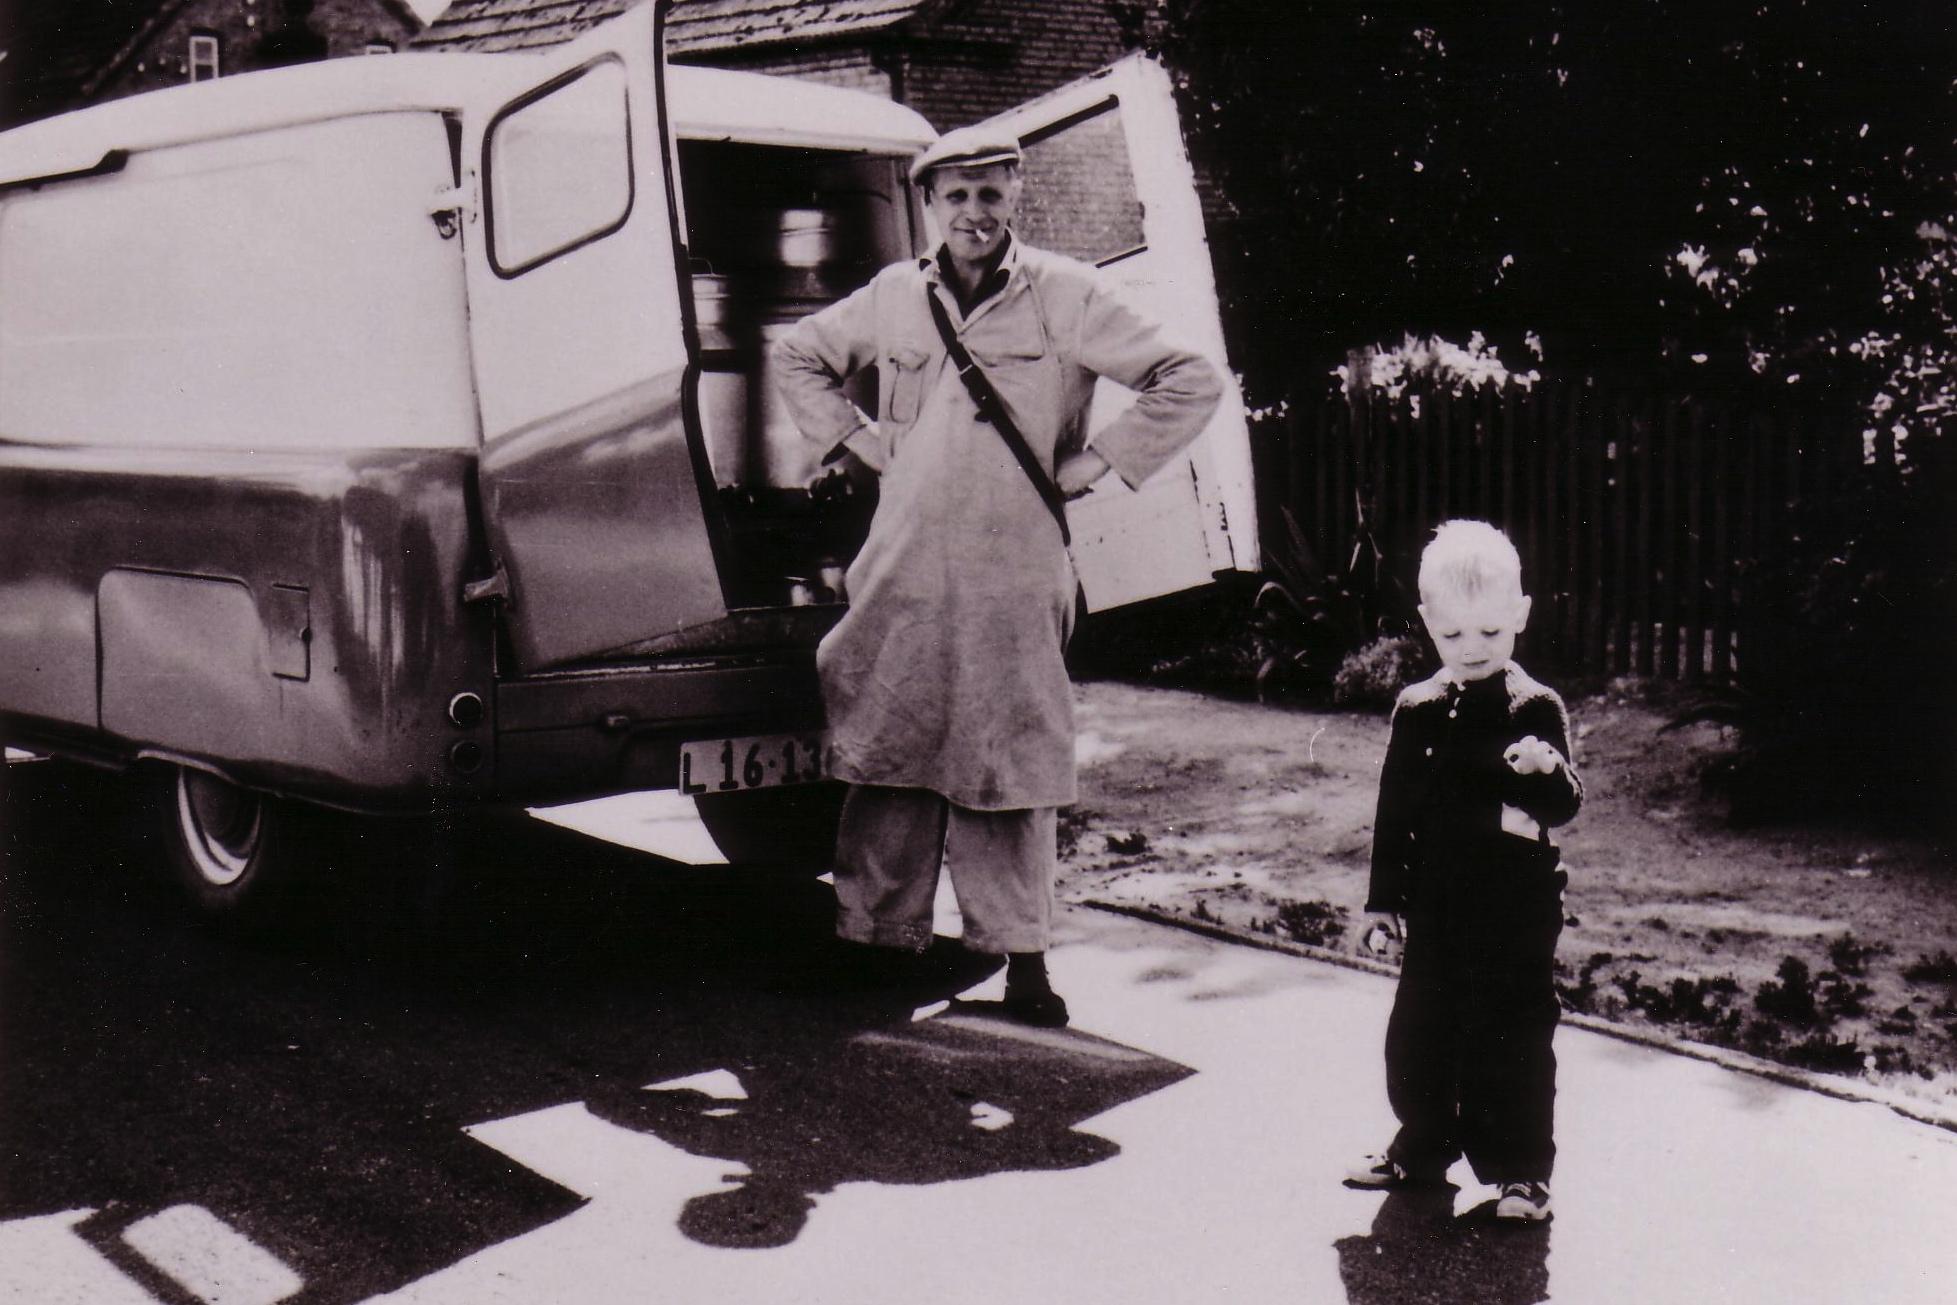 Mælkemand Børge (bixer) Hansen